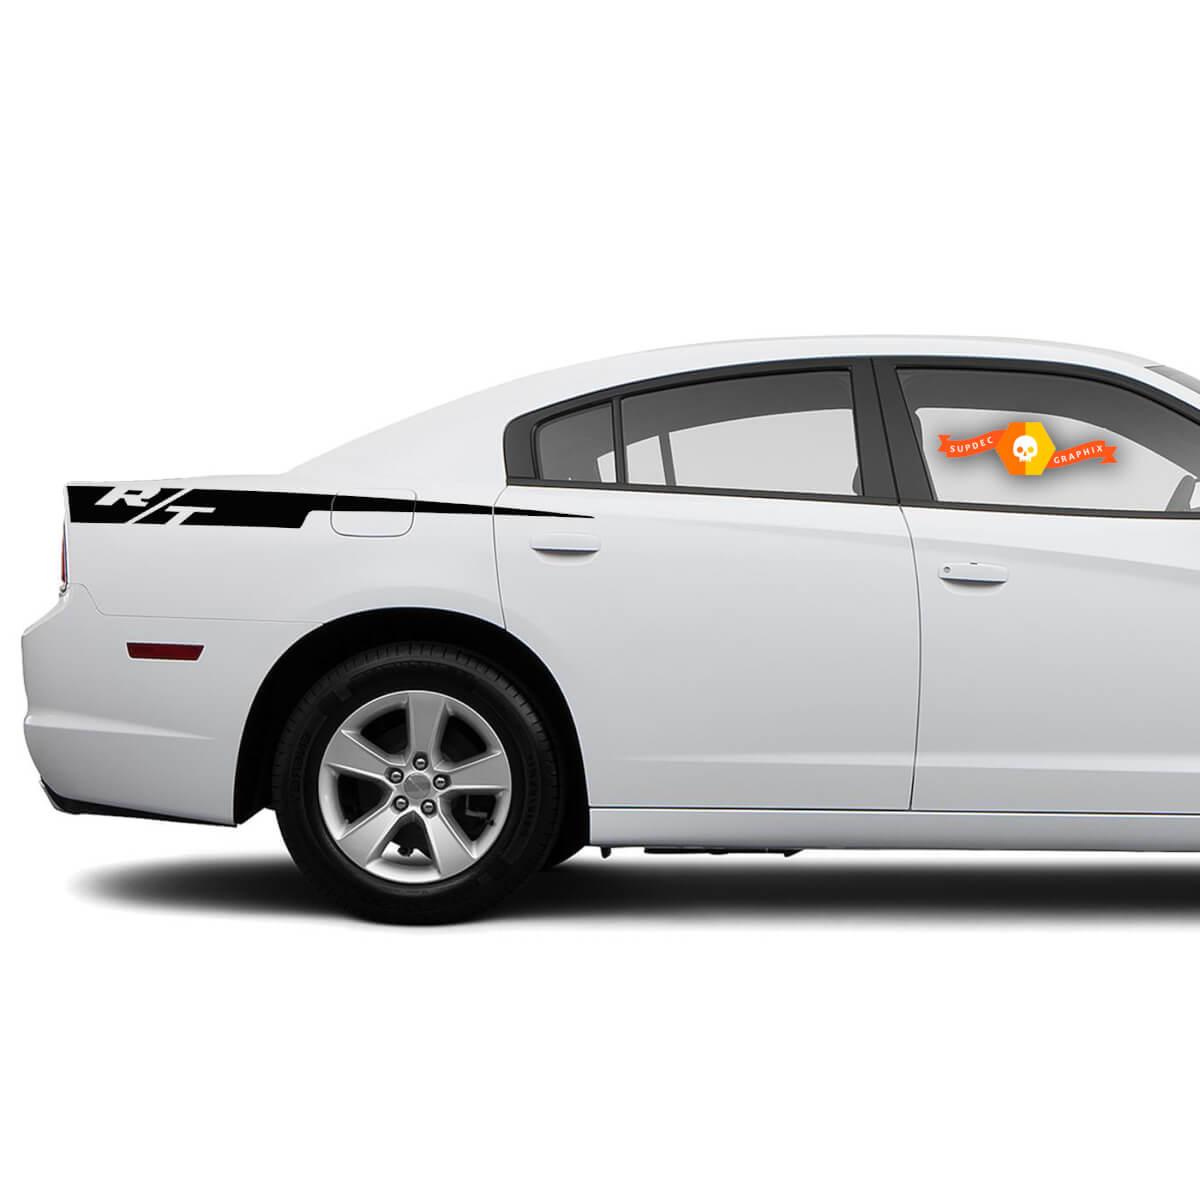 Dodge Charger R / T Rasiermesser Aufkleber Seitengrafiken passen zu den Modellen 2011-2014